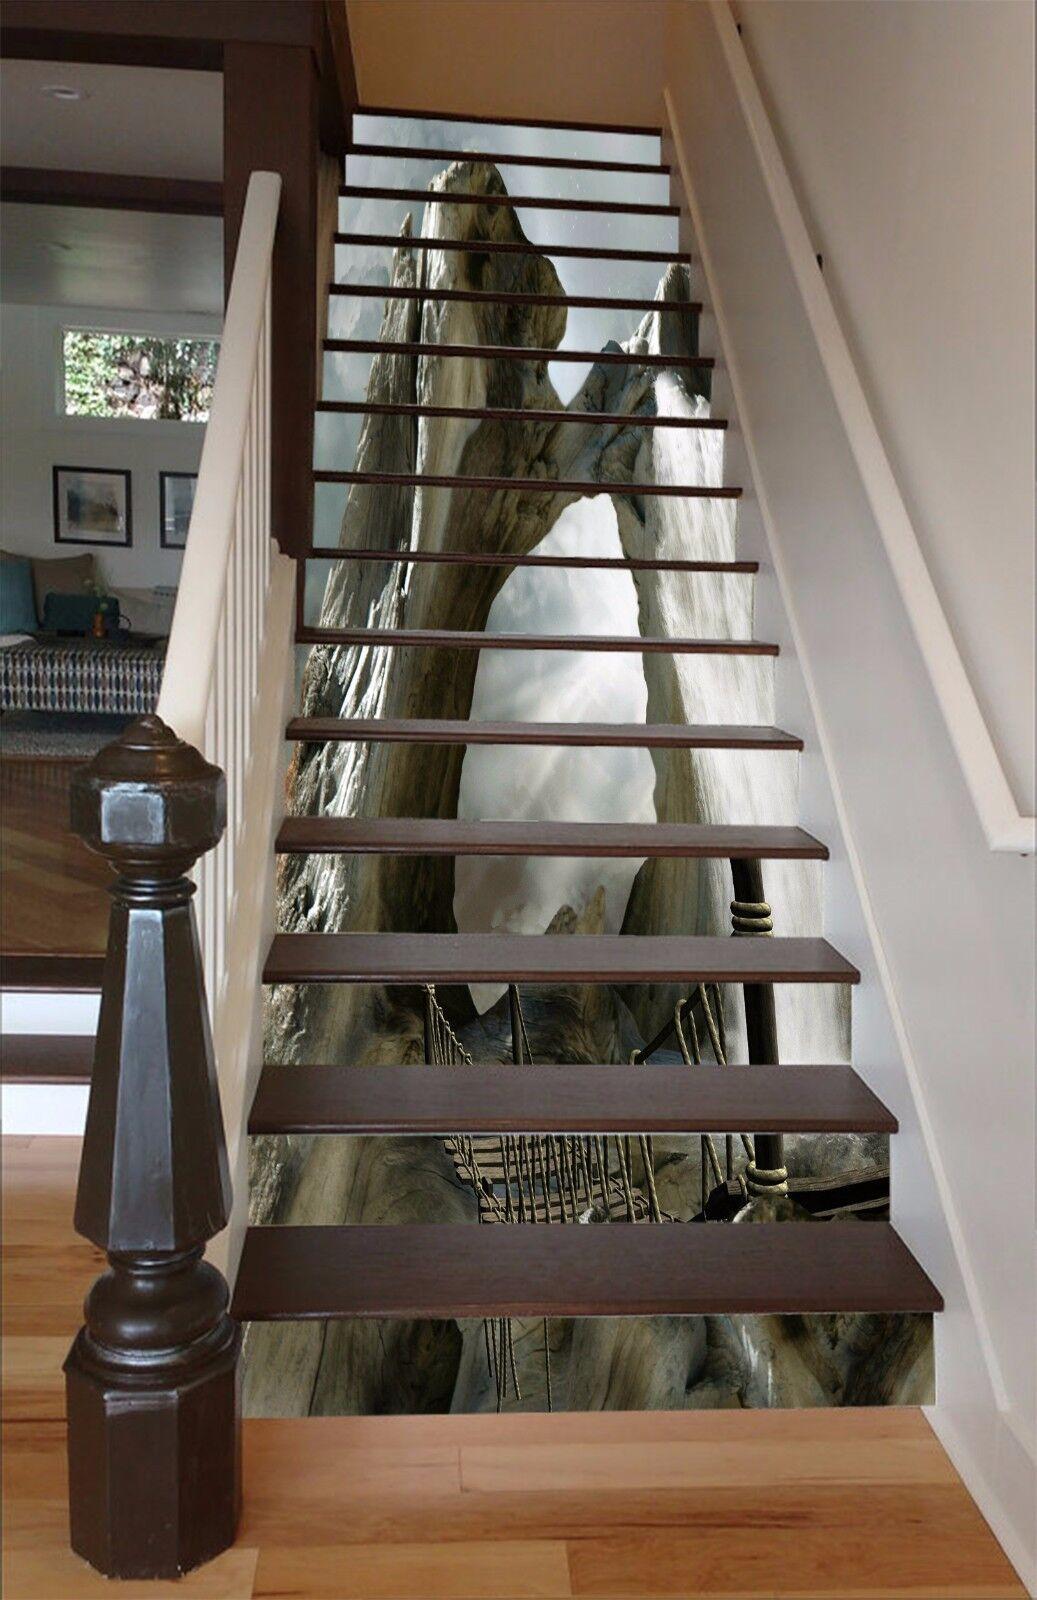 3D Peak Scenery 840 Stair Risers Decoration Photo Mural Vinyl Decal Wallpaper AU